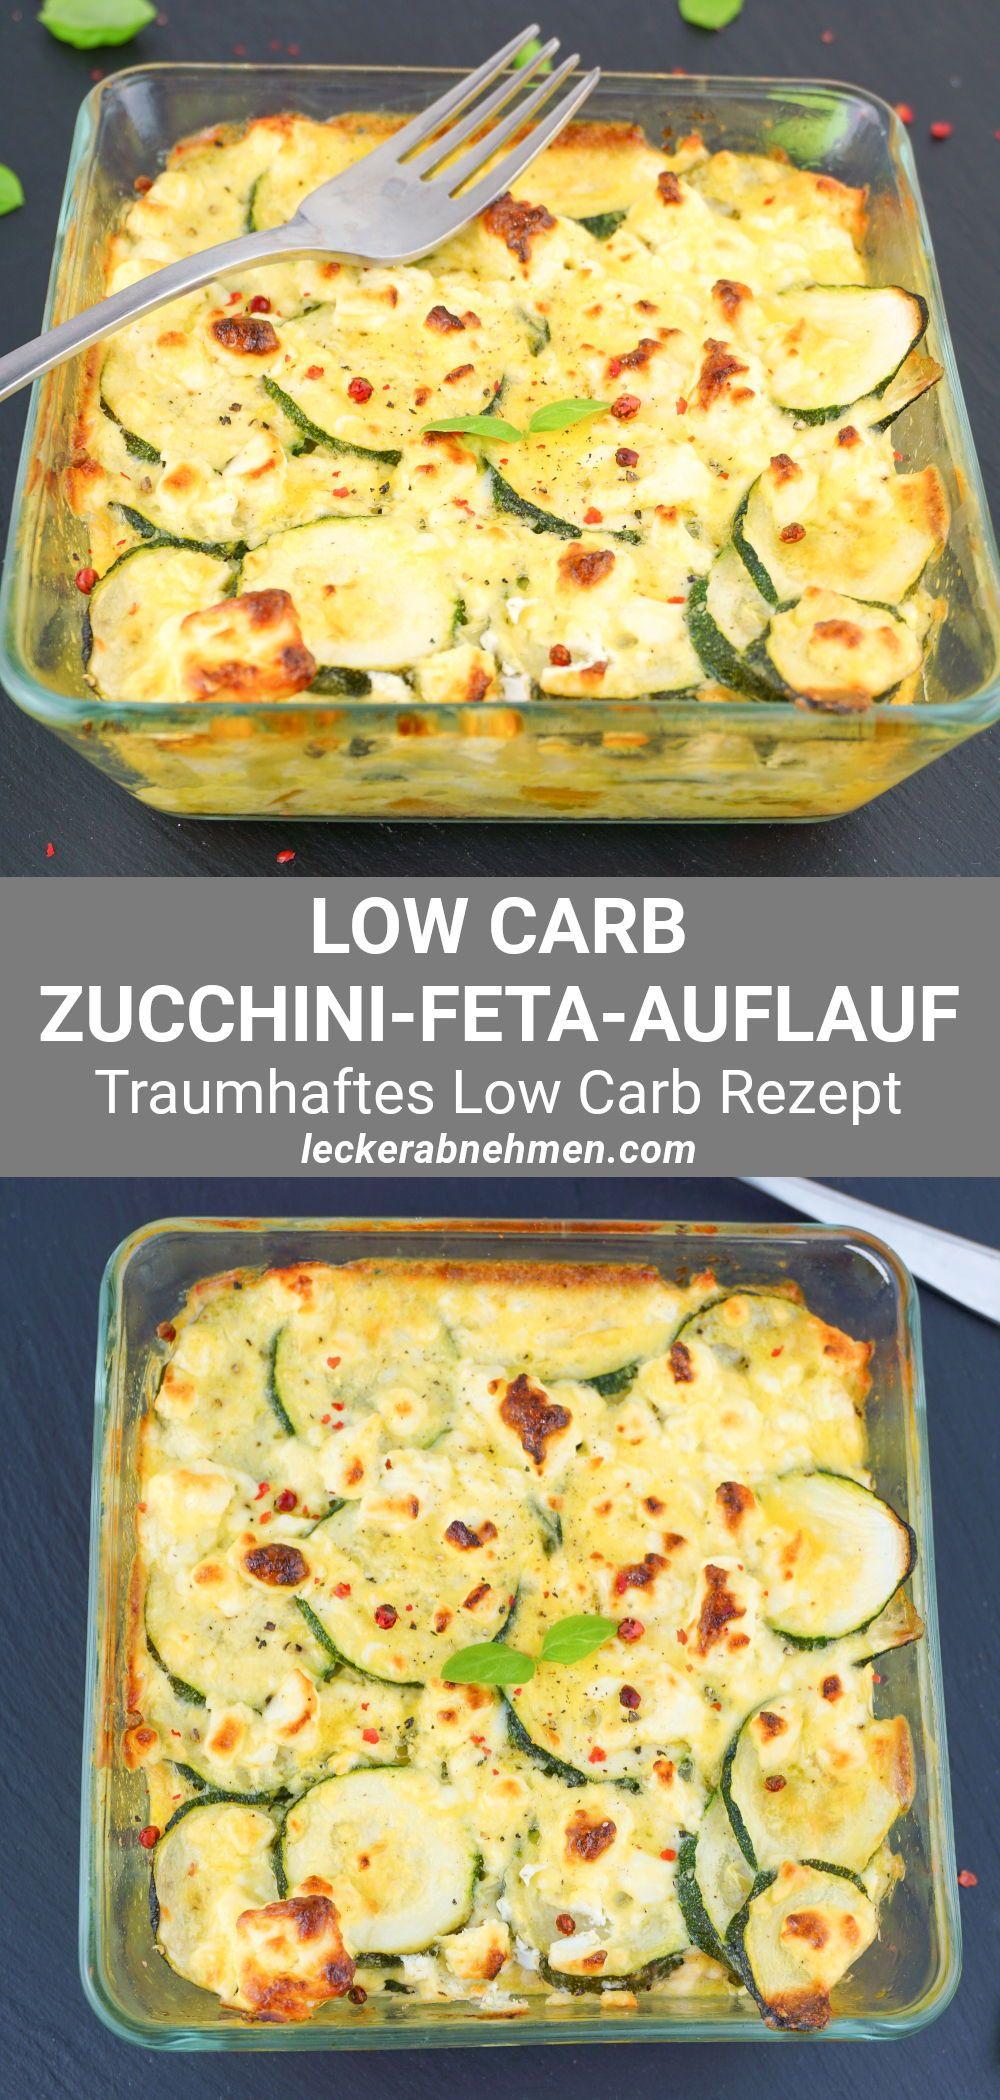 Low Carb Zucchini Auflauf mit Feta - Rezept zum Abnehmen